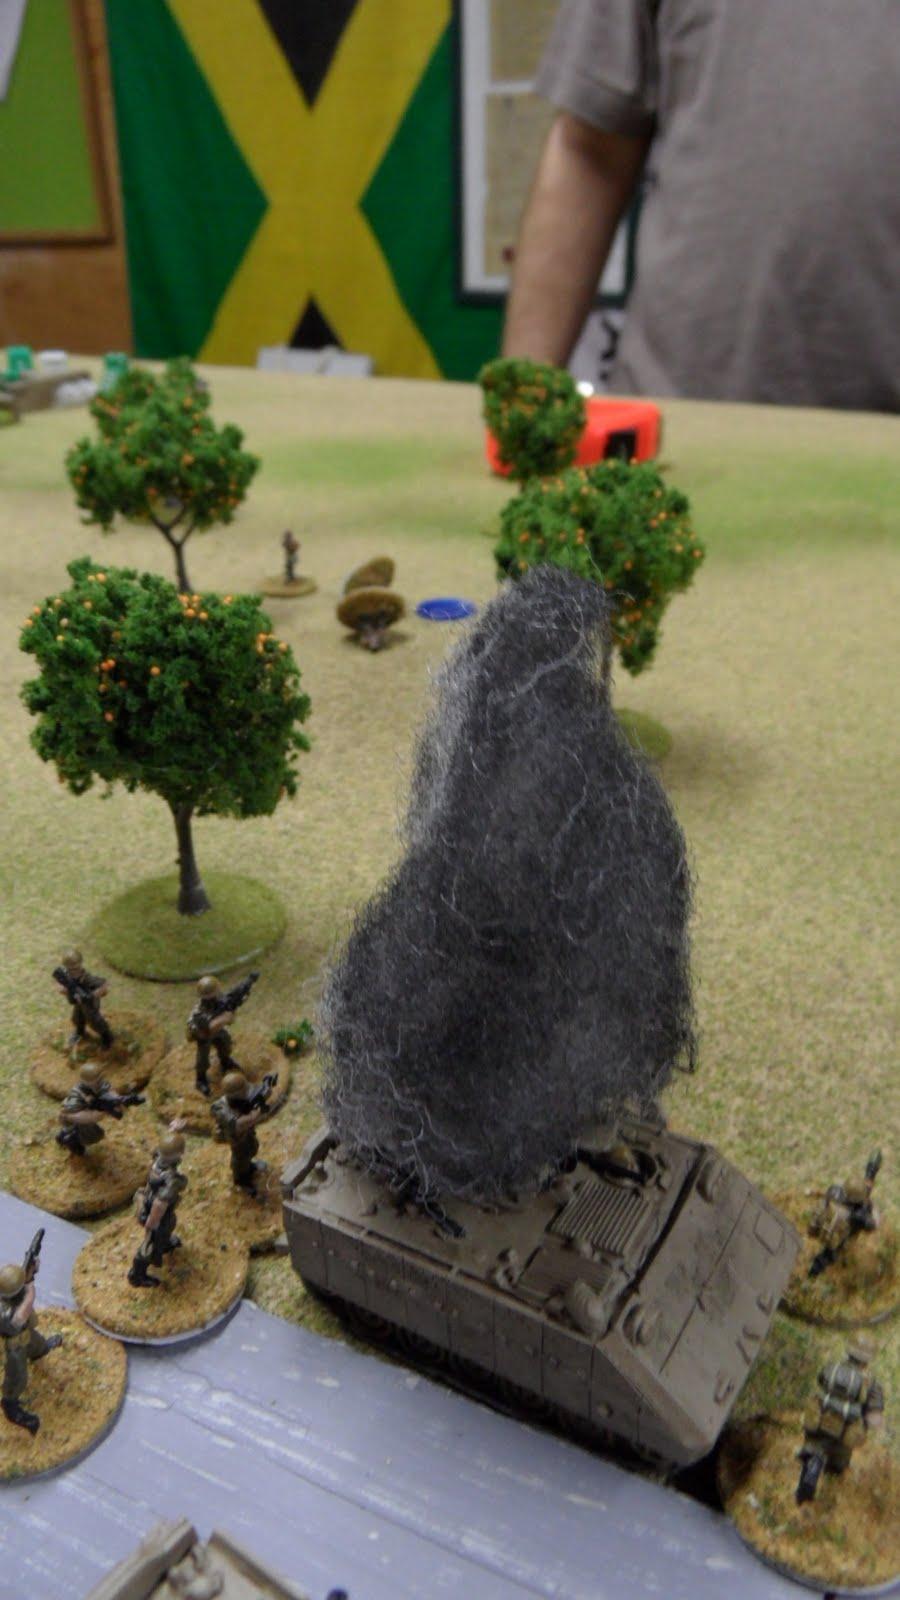 the IDF infantry swiftly took revenge